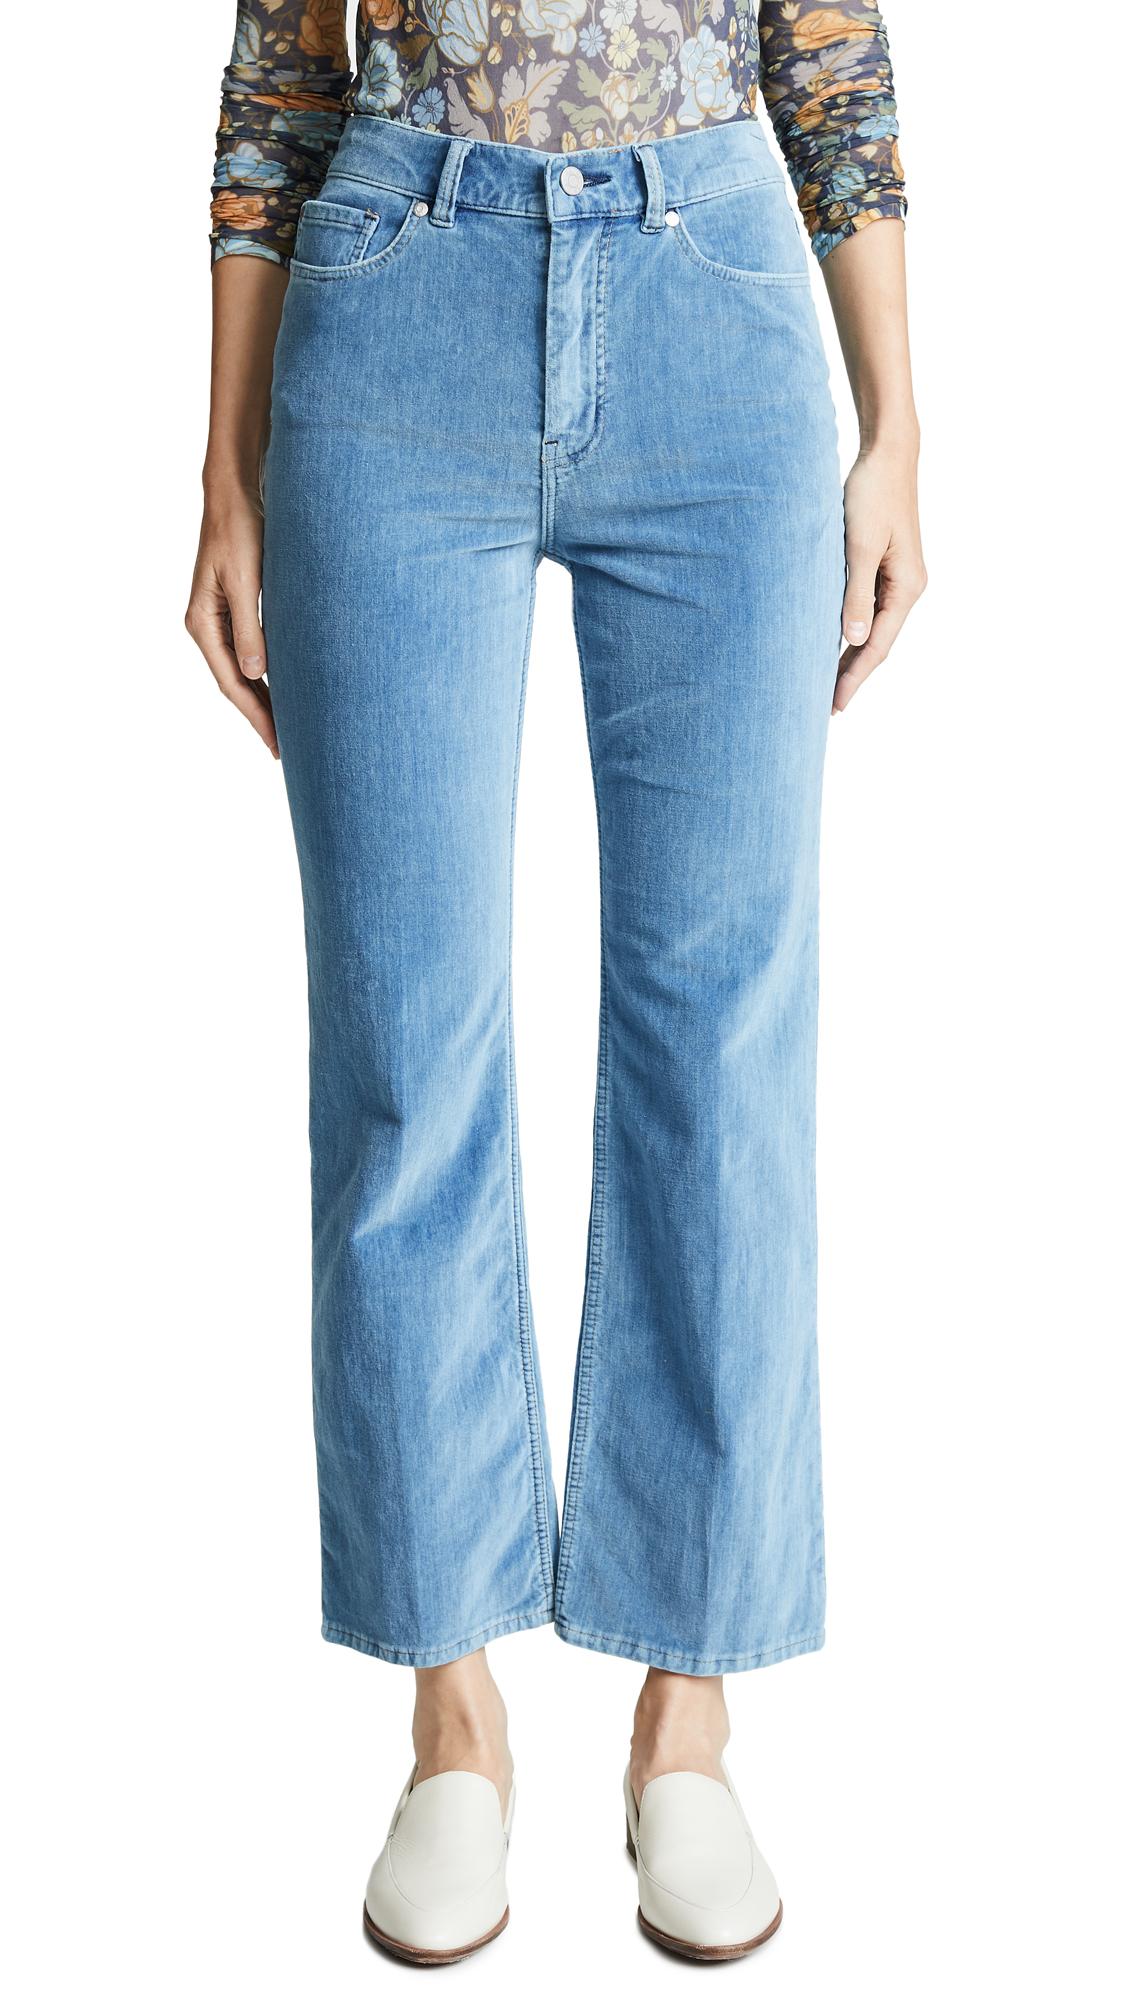 La Vie Rebecca Taylor Velveteen Jeans In Mid Tone Indigo